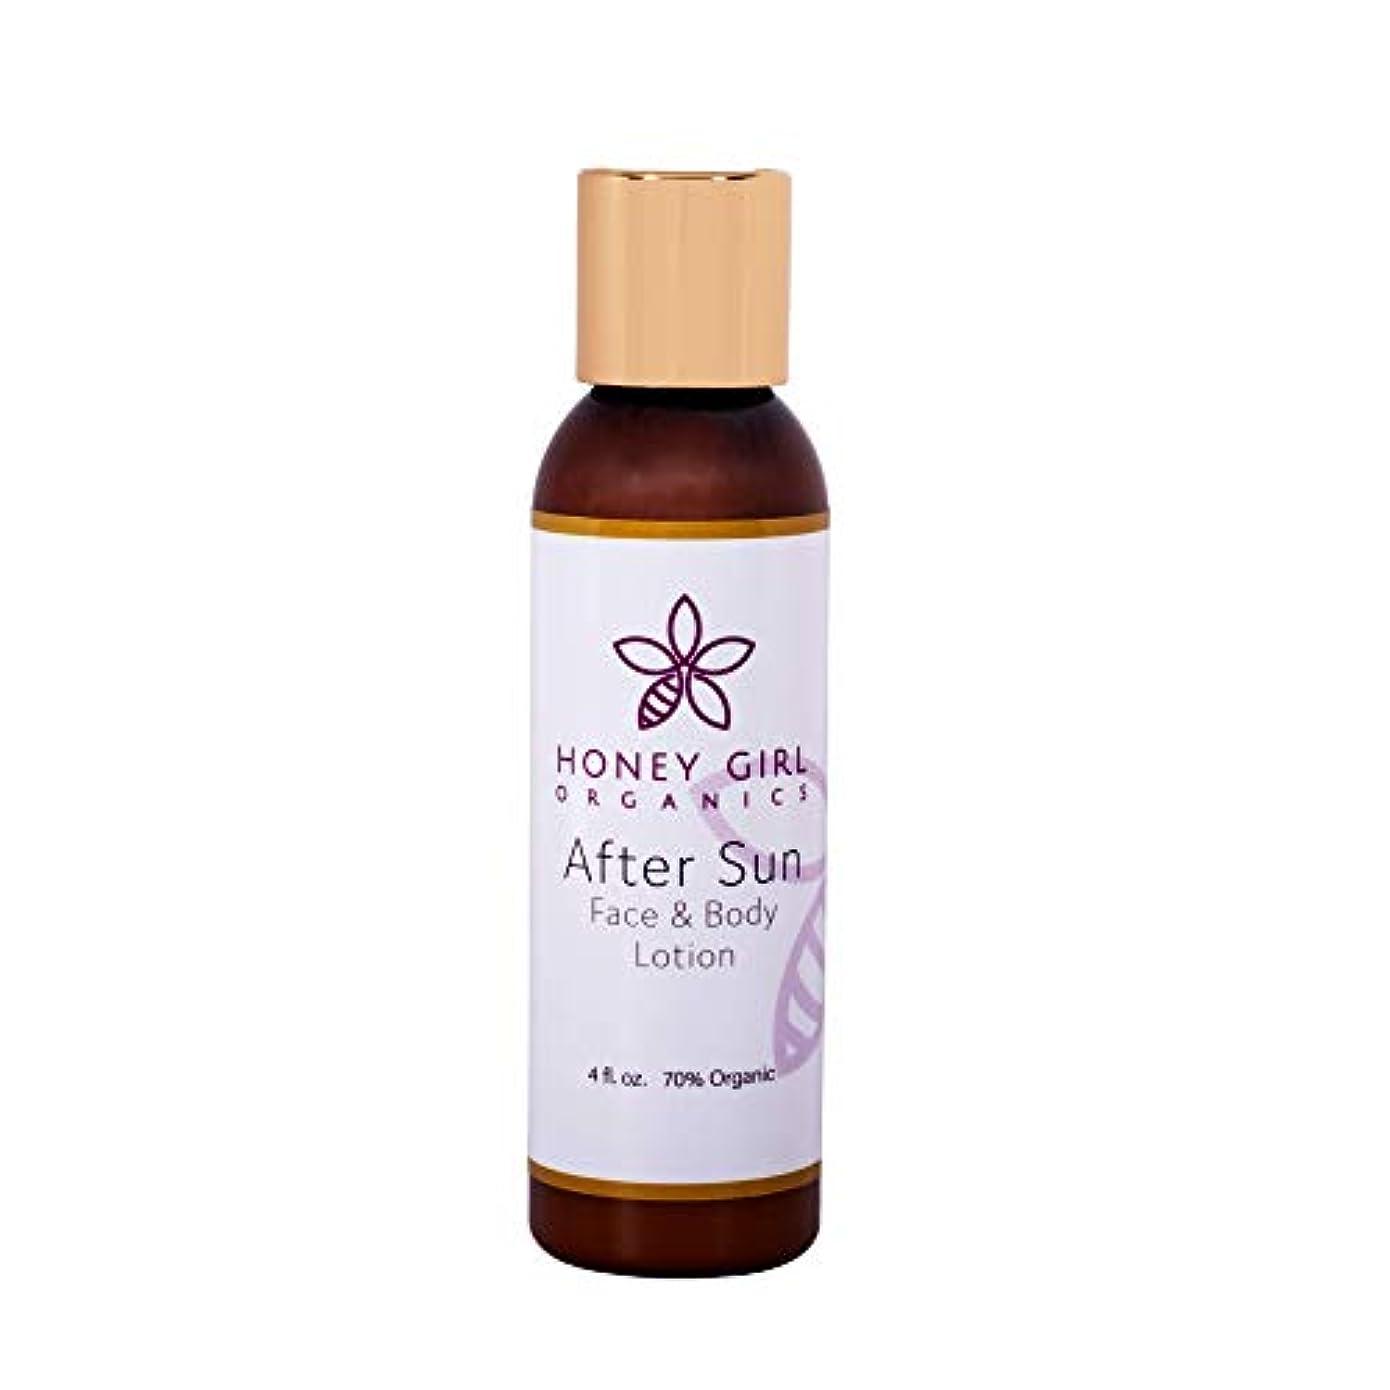 Honey Girl Organics, After Sun, Face & Body Lotion, 4 fl oz